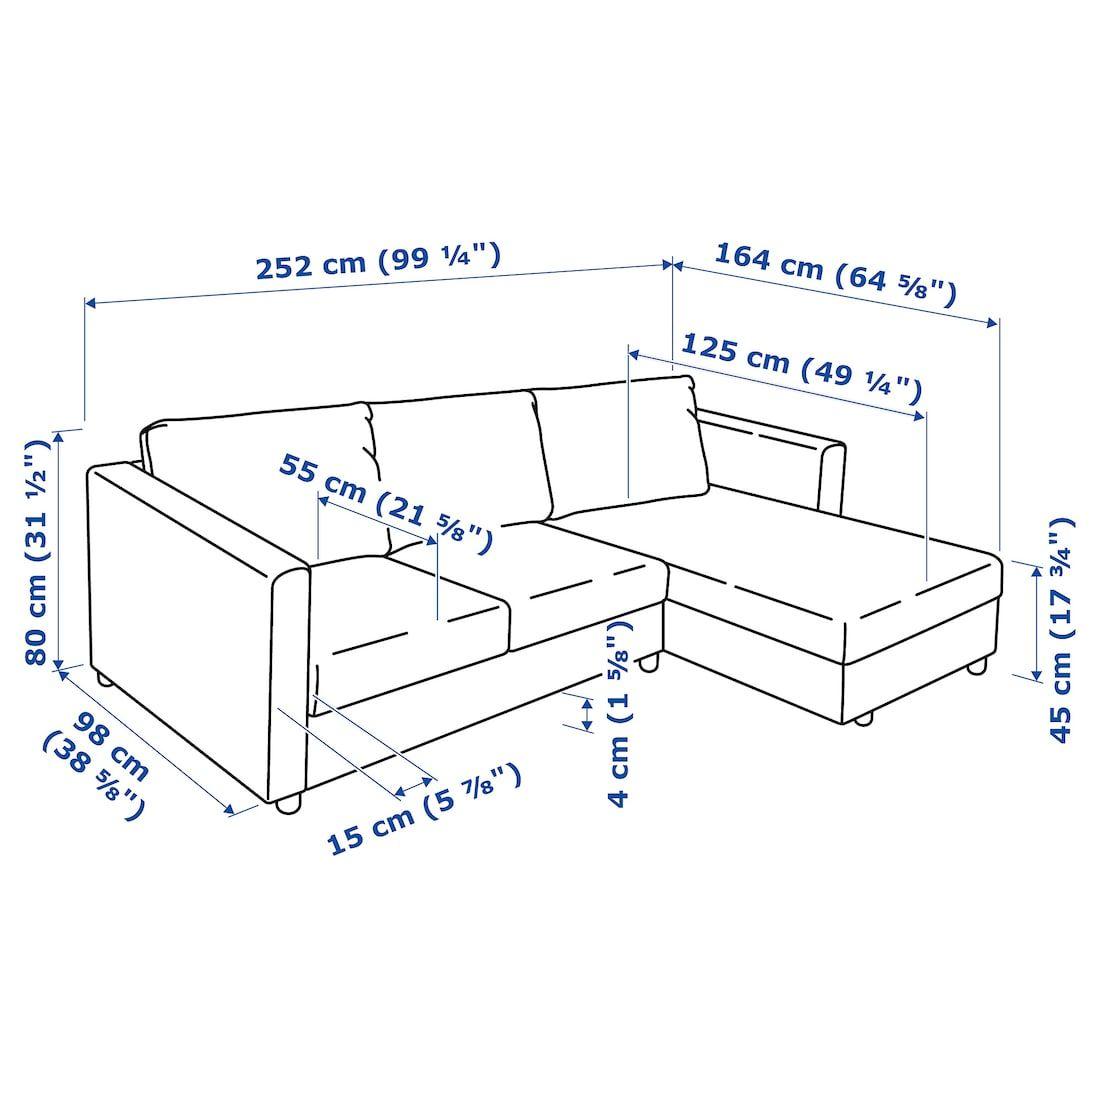 Vimle Sofa With Chaise Farsta Dark Brown Ikea In 2020 Dark Brown Chaise Sofa